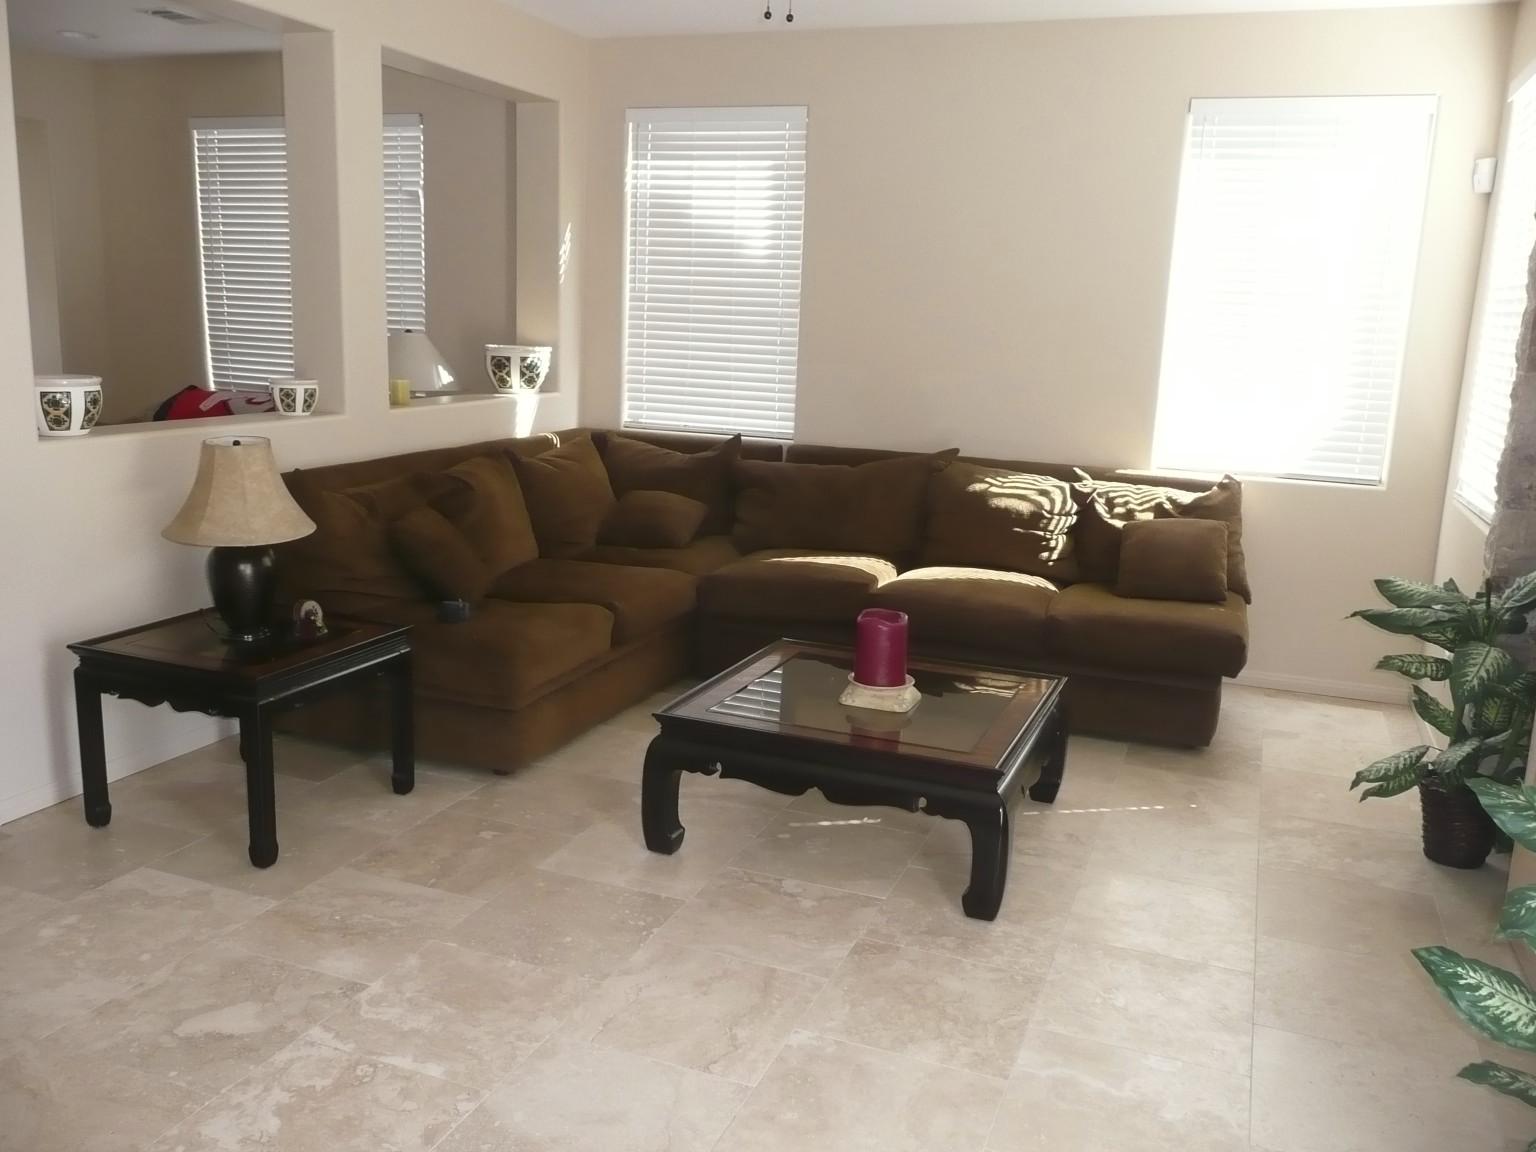 Furniture Stores Inaround Las Vegas Sale Hotel New